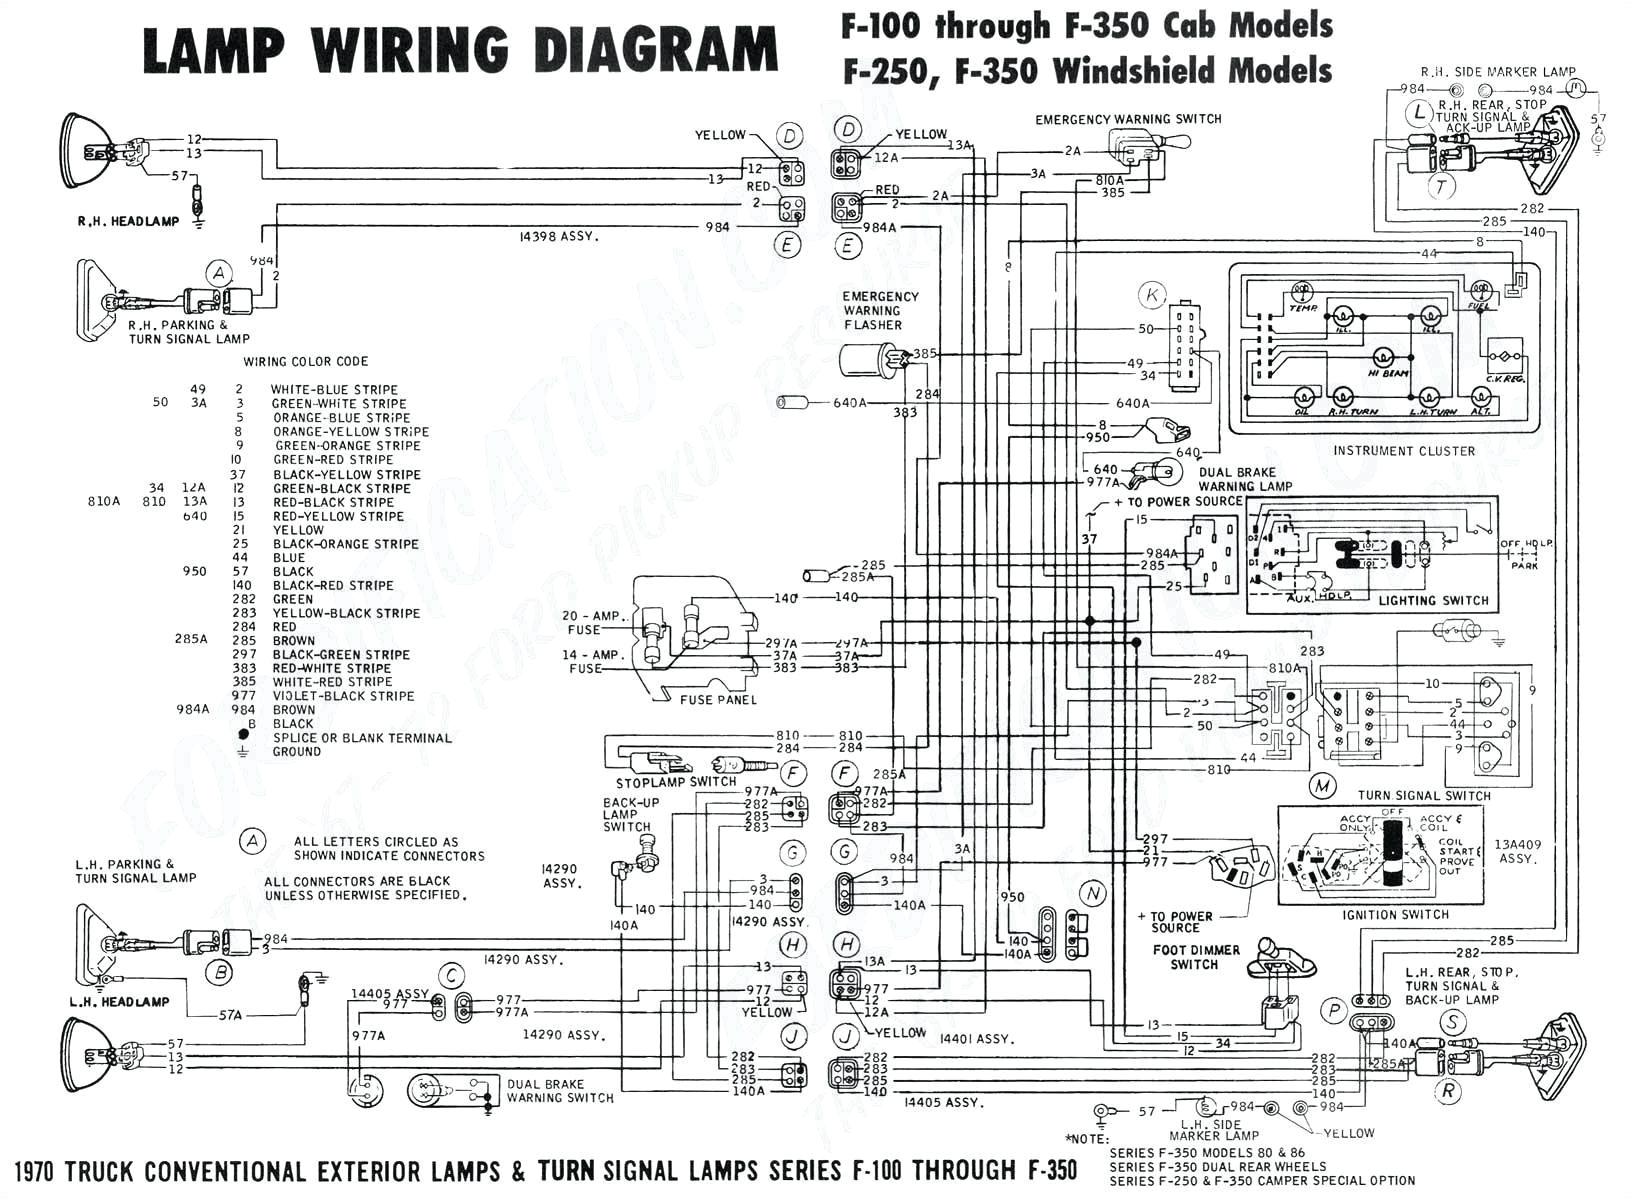 toyota corolla fog light wiring diagram wiring diagram car fog lights new wiring diagram trailer lights fresh wiring diagram trailer australia 5j jpg